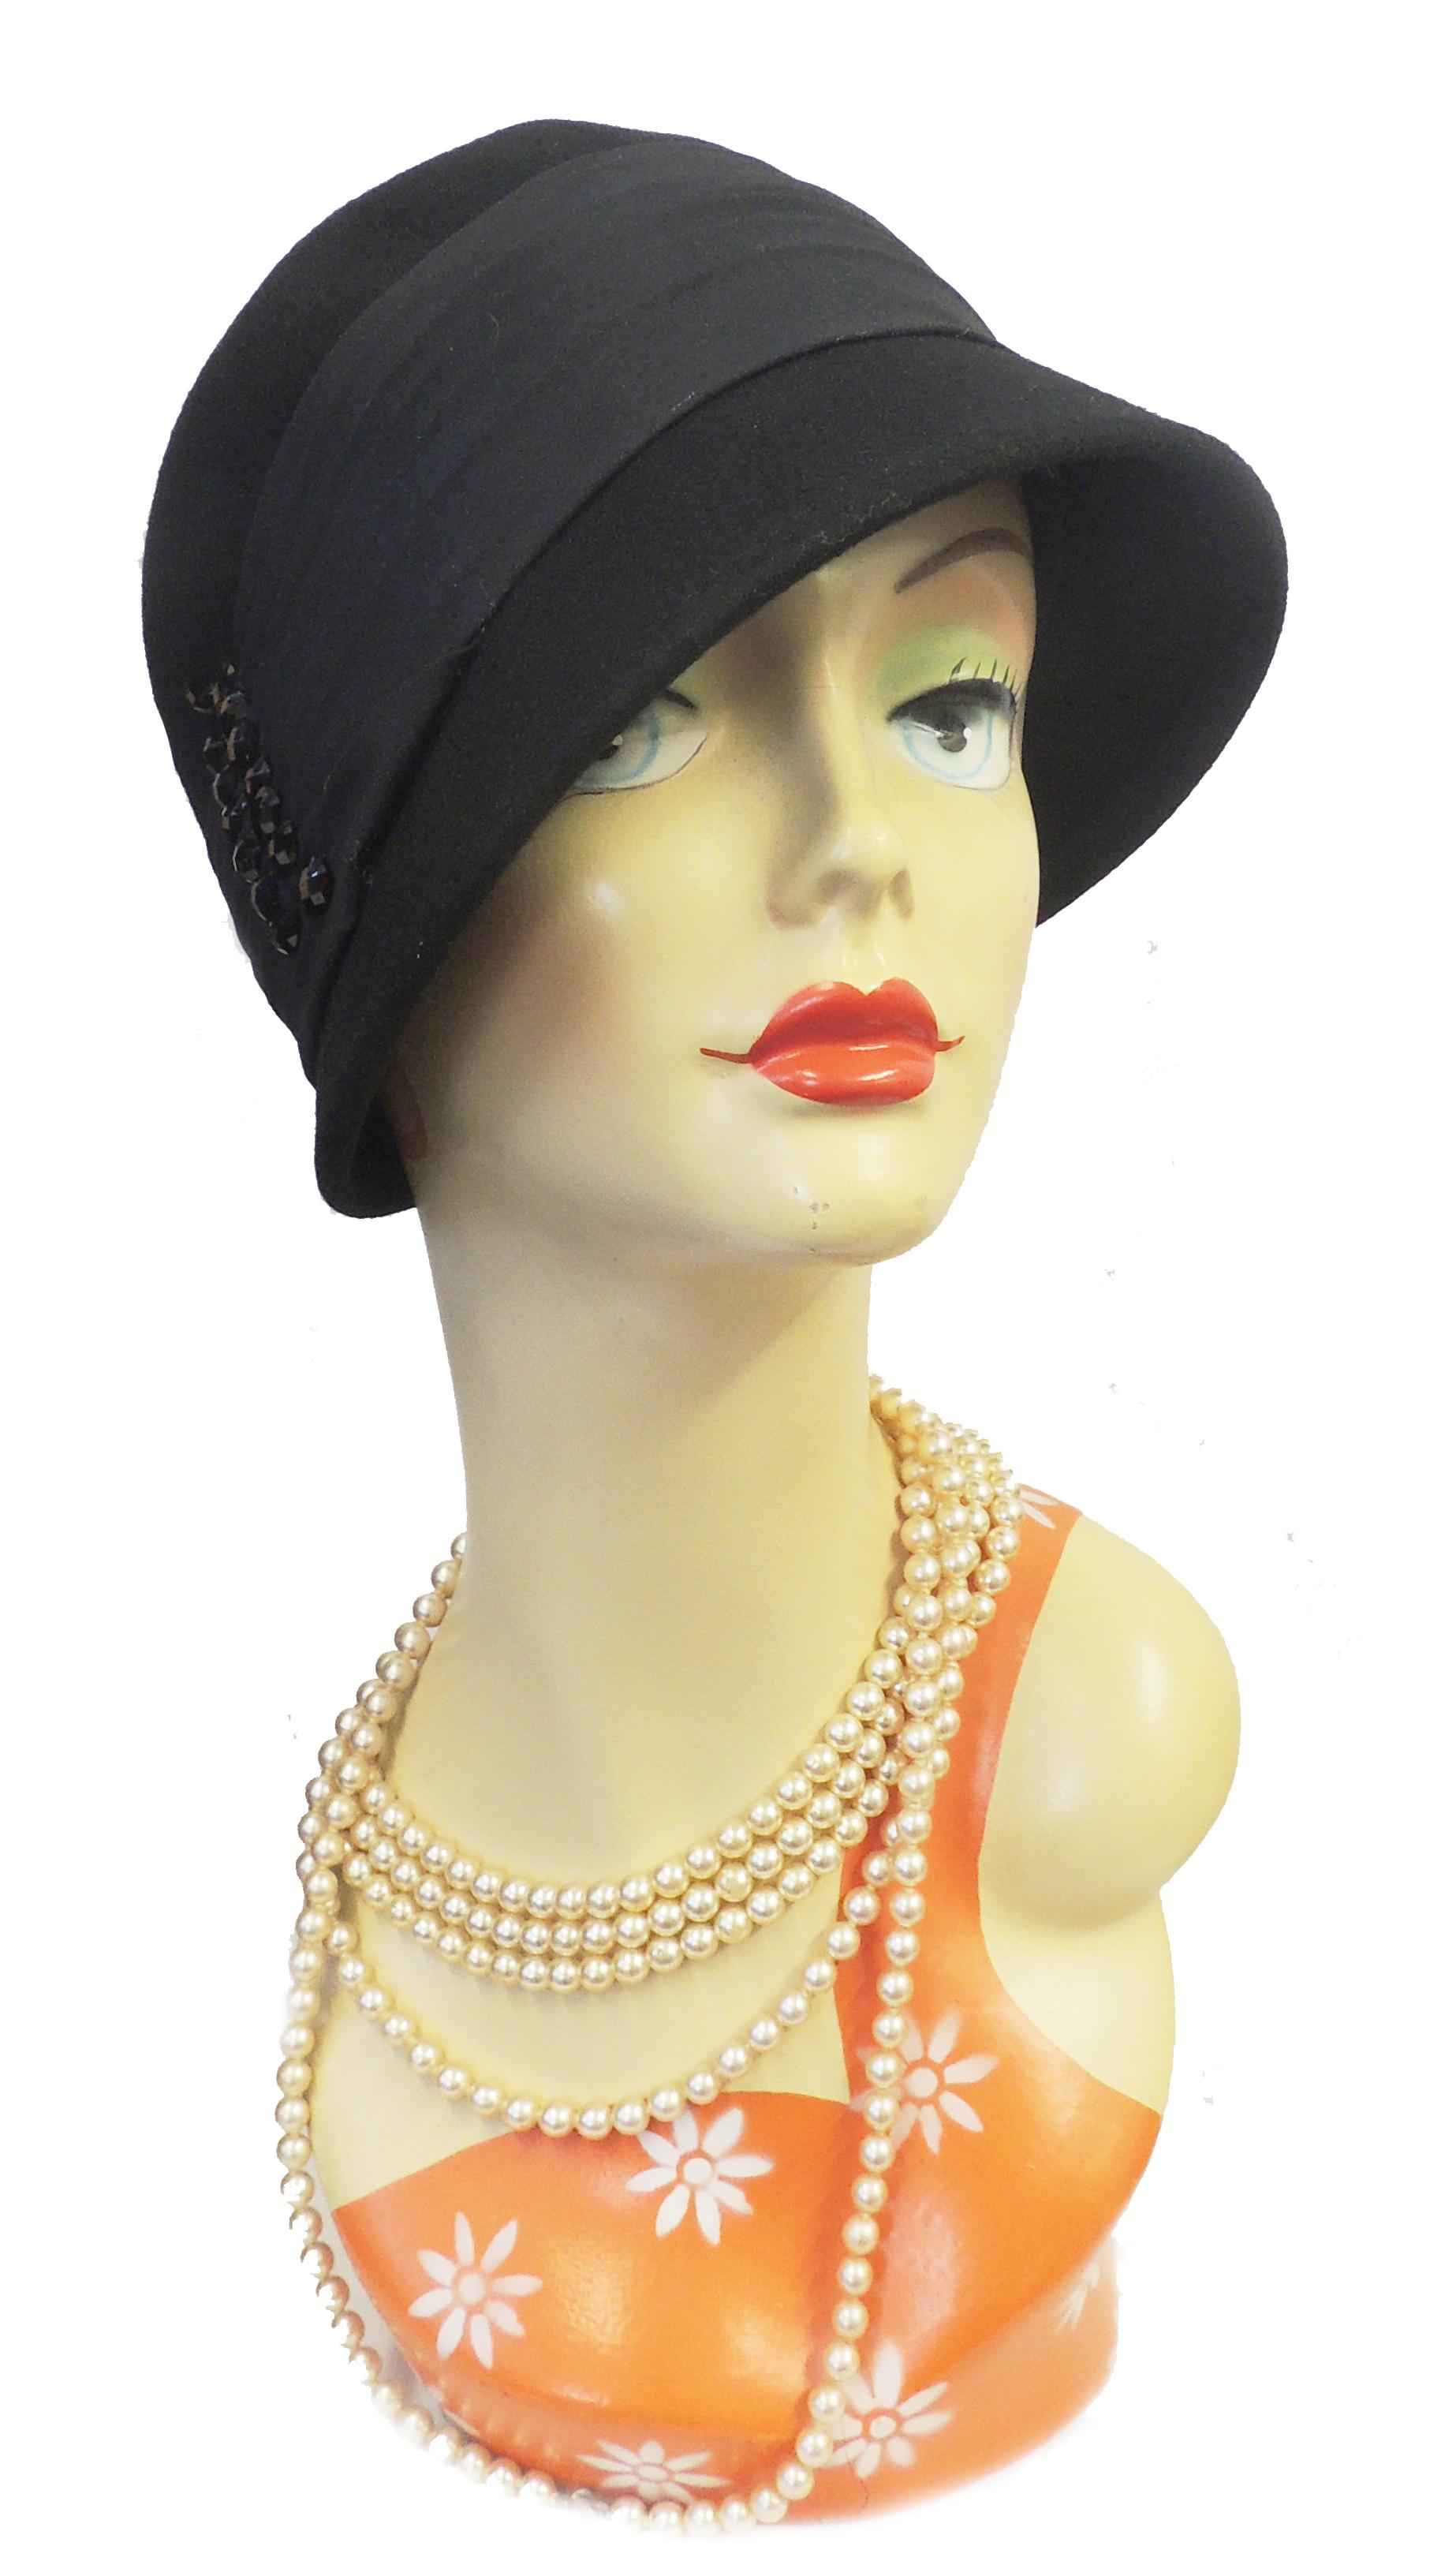 New VTG 1920's 30's 40's style Felt Cloche Flapper Downton Hat in Red / Black